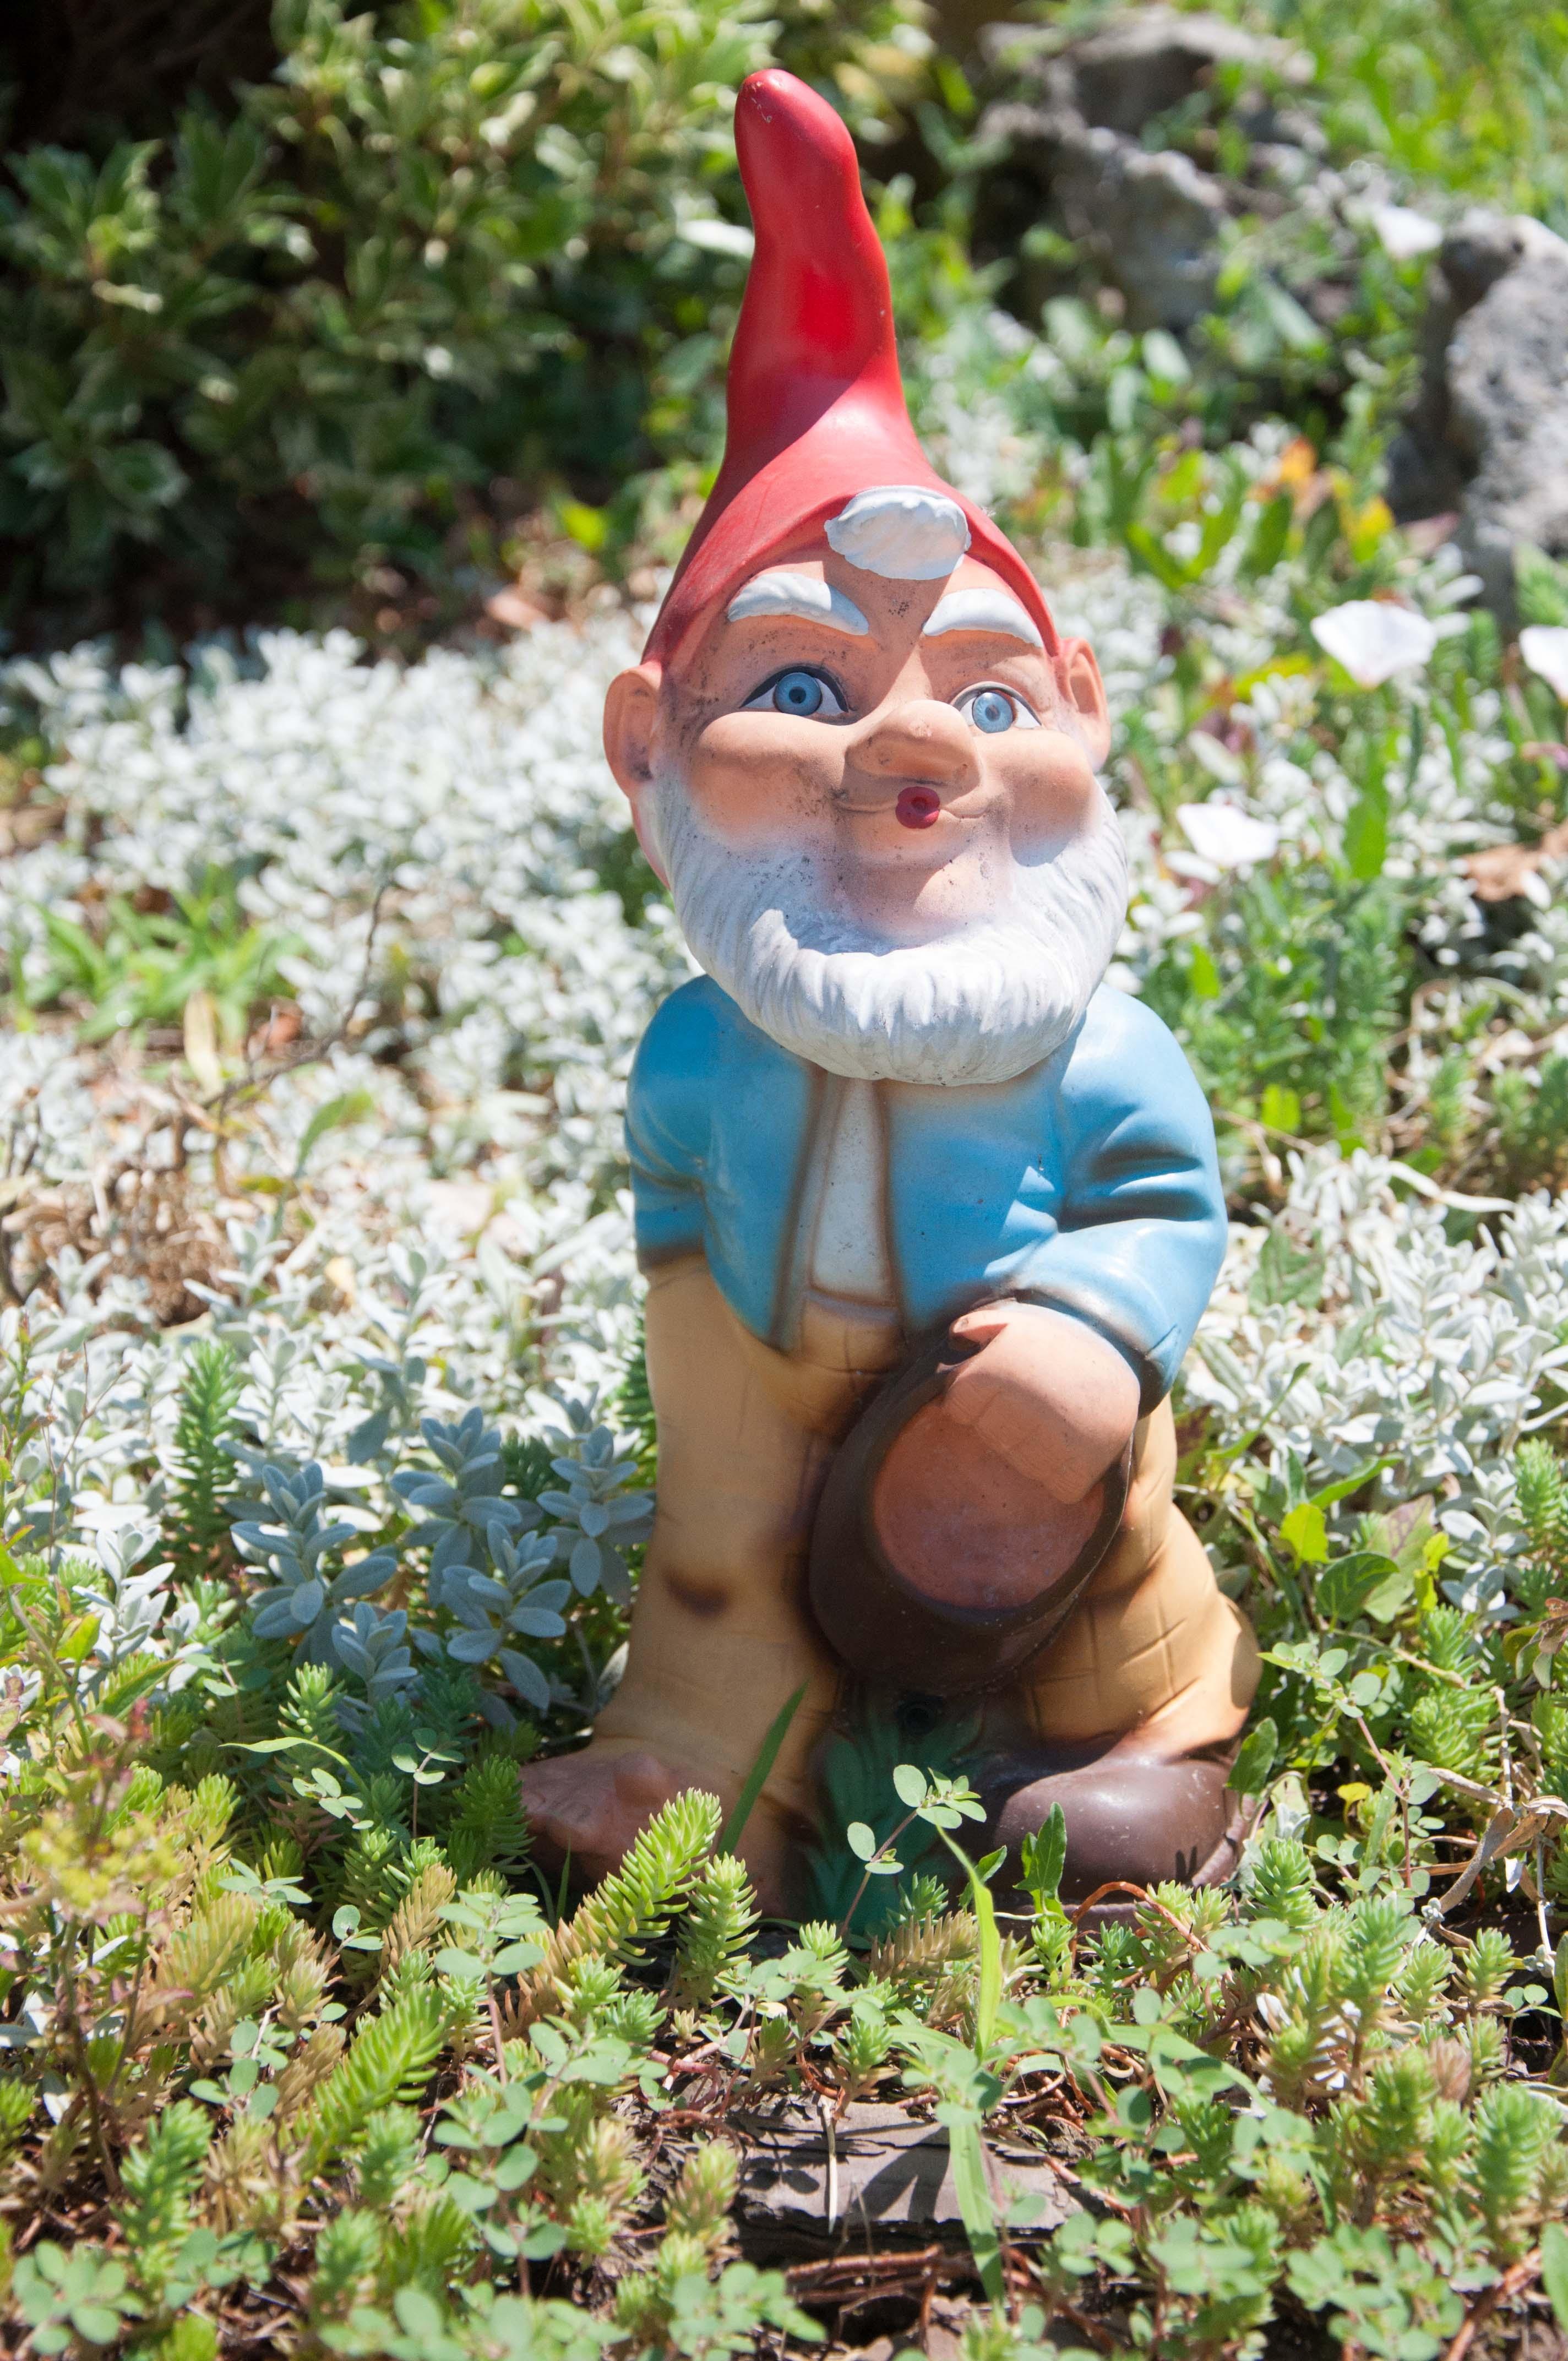 Monument Statue Garden Figure Garden Figurines Garden Gnome Lawn Ornament